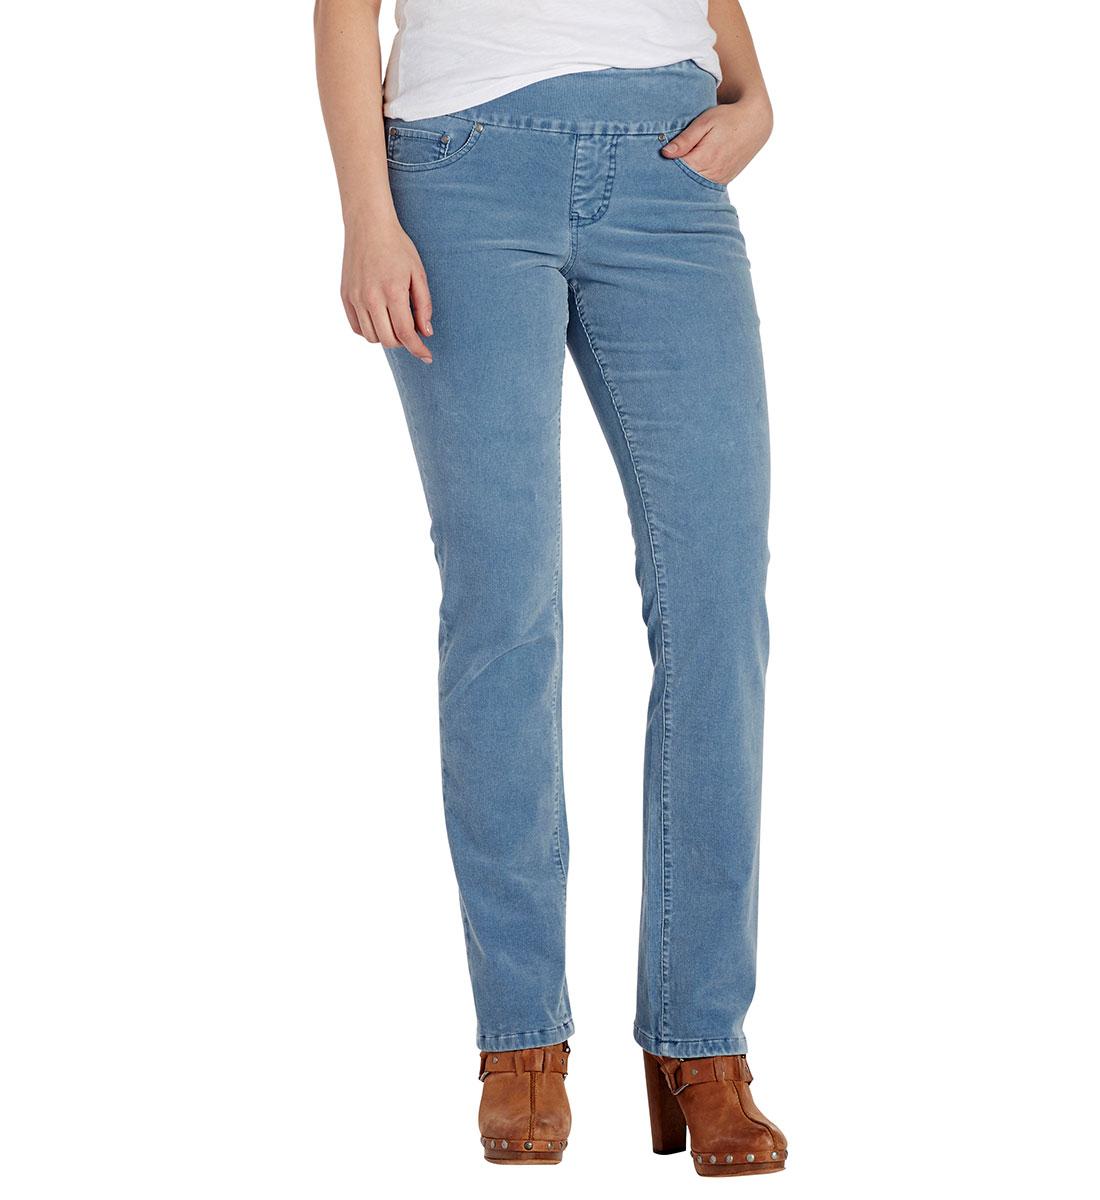 e5c49b9c7b8 Peri Straight Leg Corduroy Blue Front